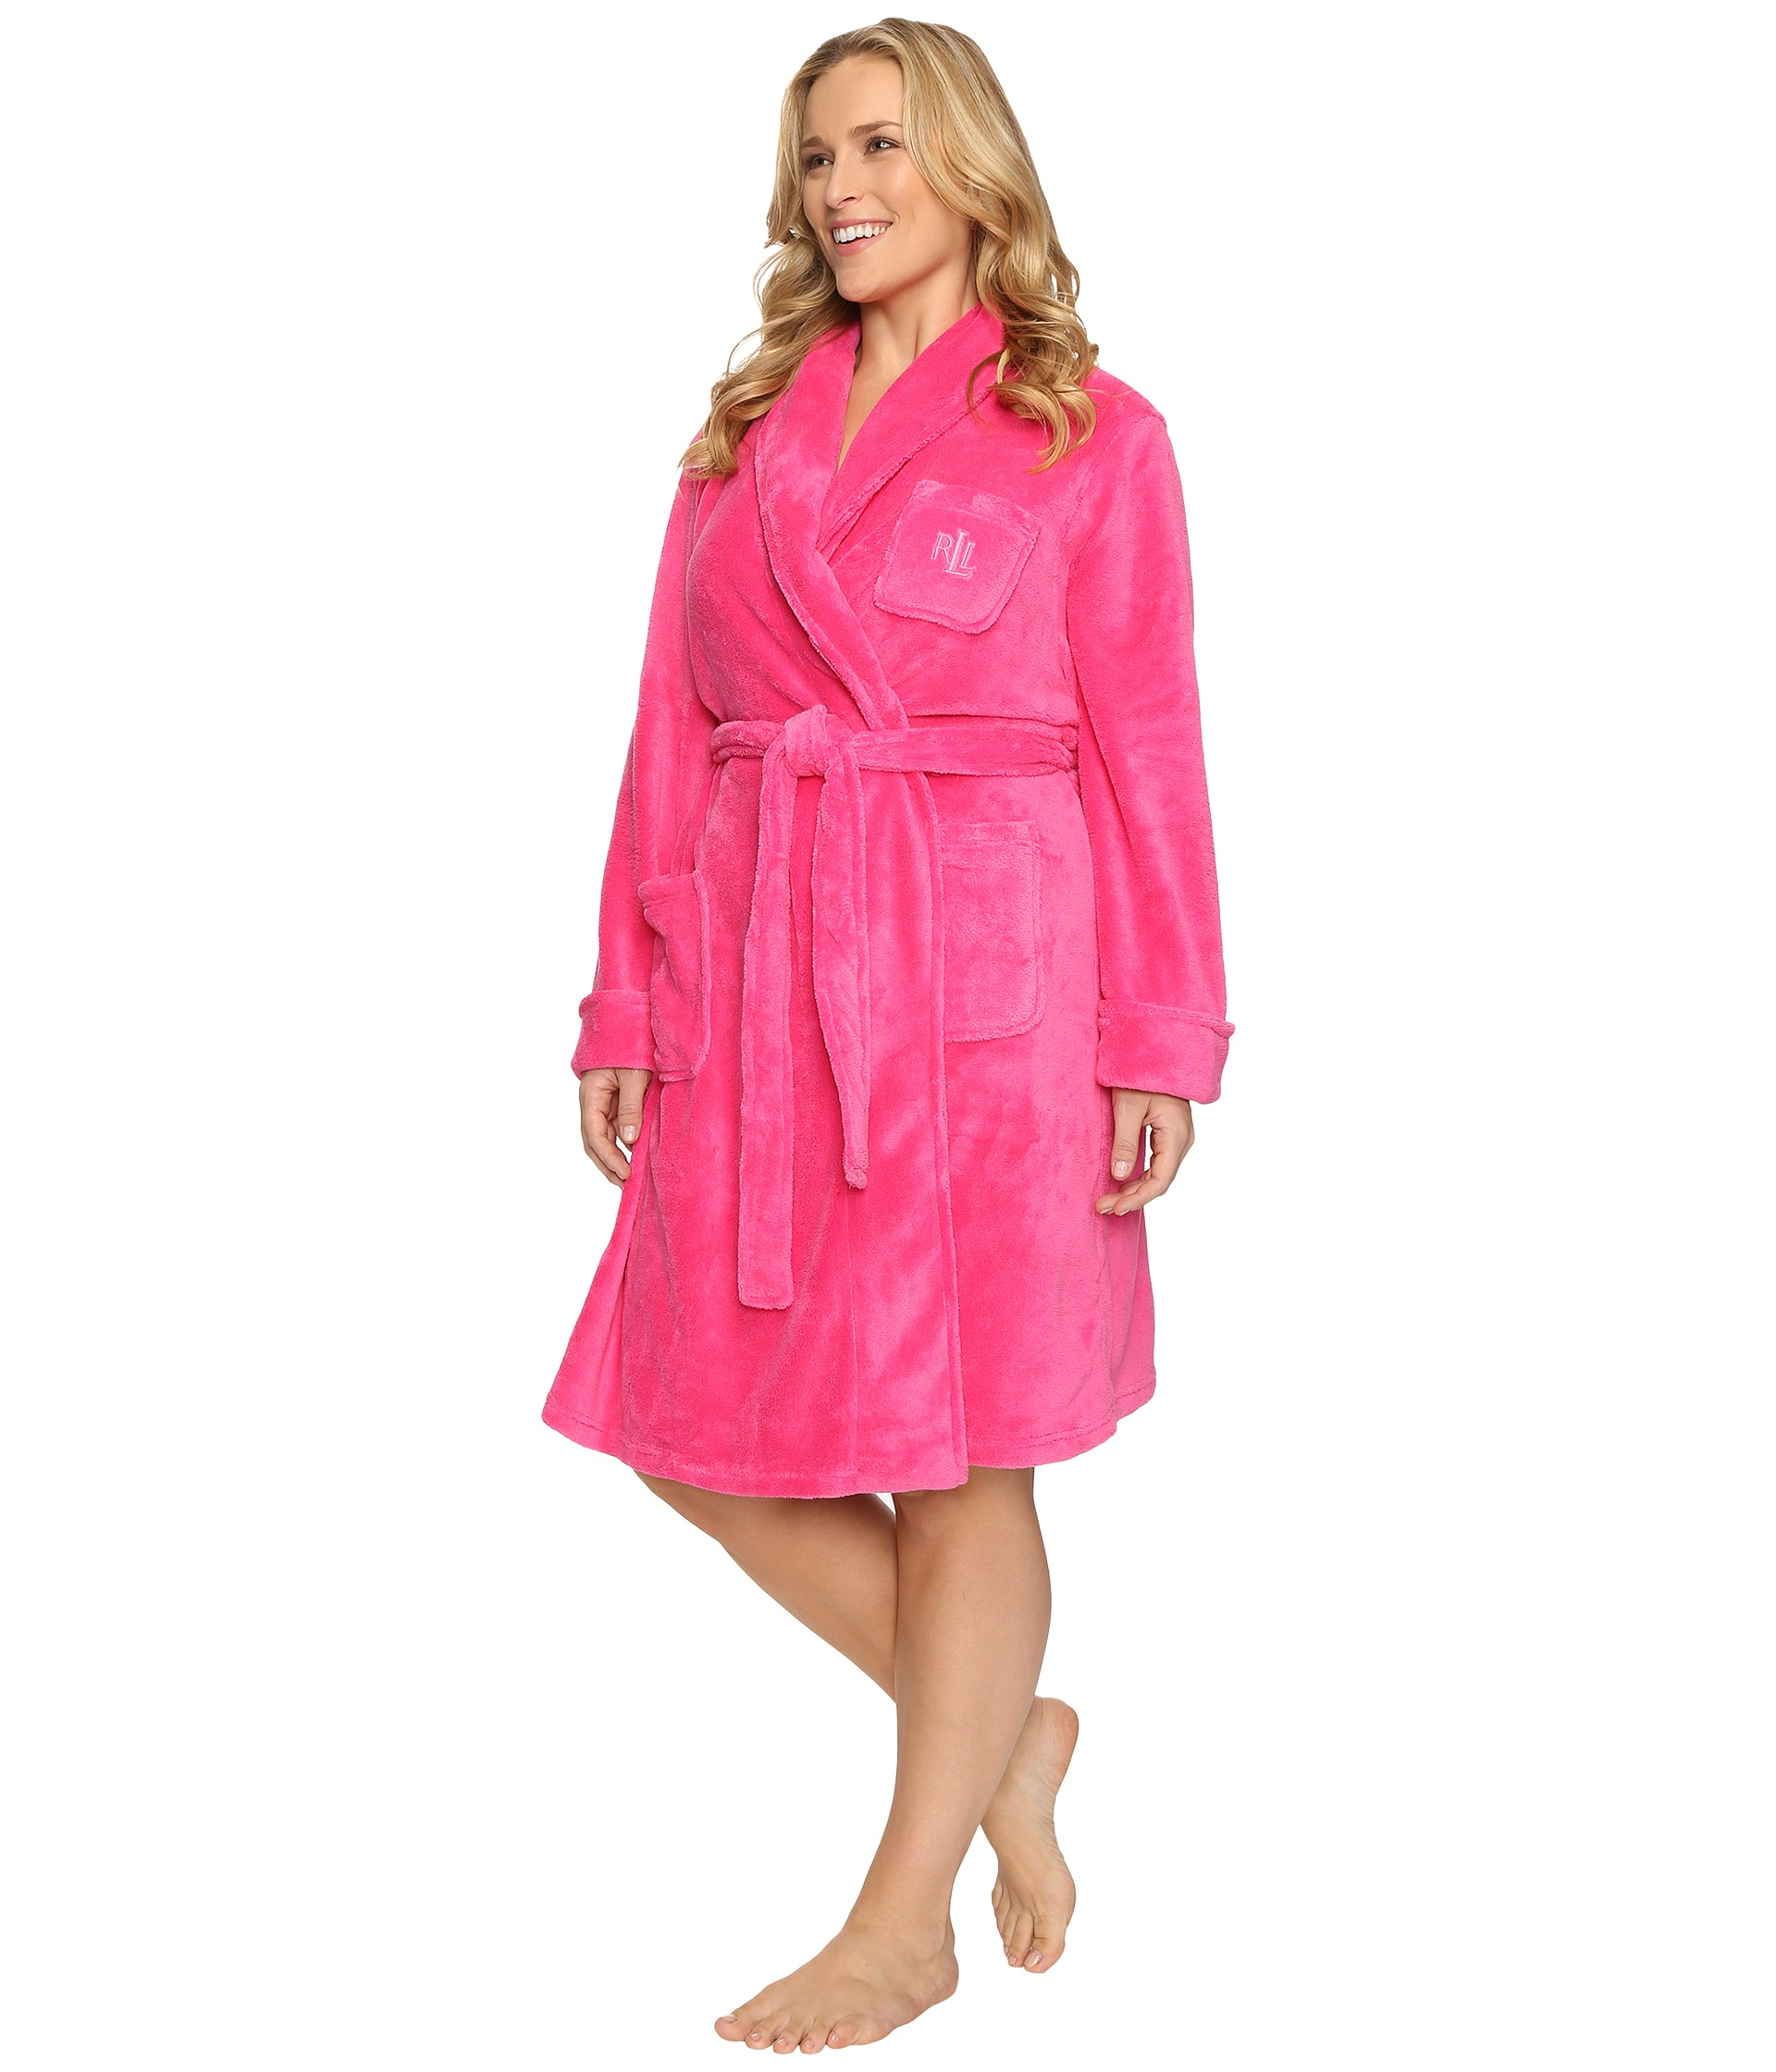 lauren ralph lauren plus size so soft short robe pink free shipping both ways. Black Bedroom Furniture Sets. Home Design Ideas